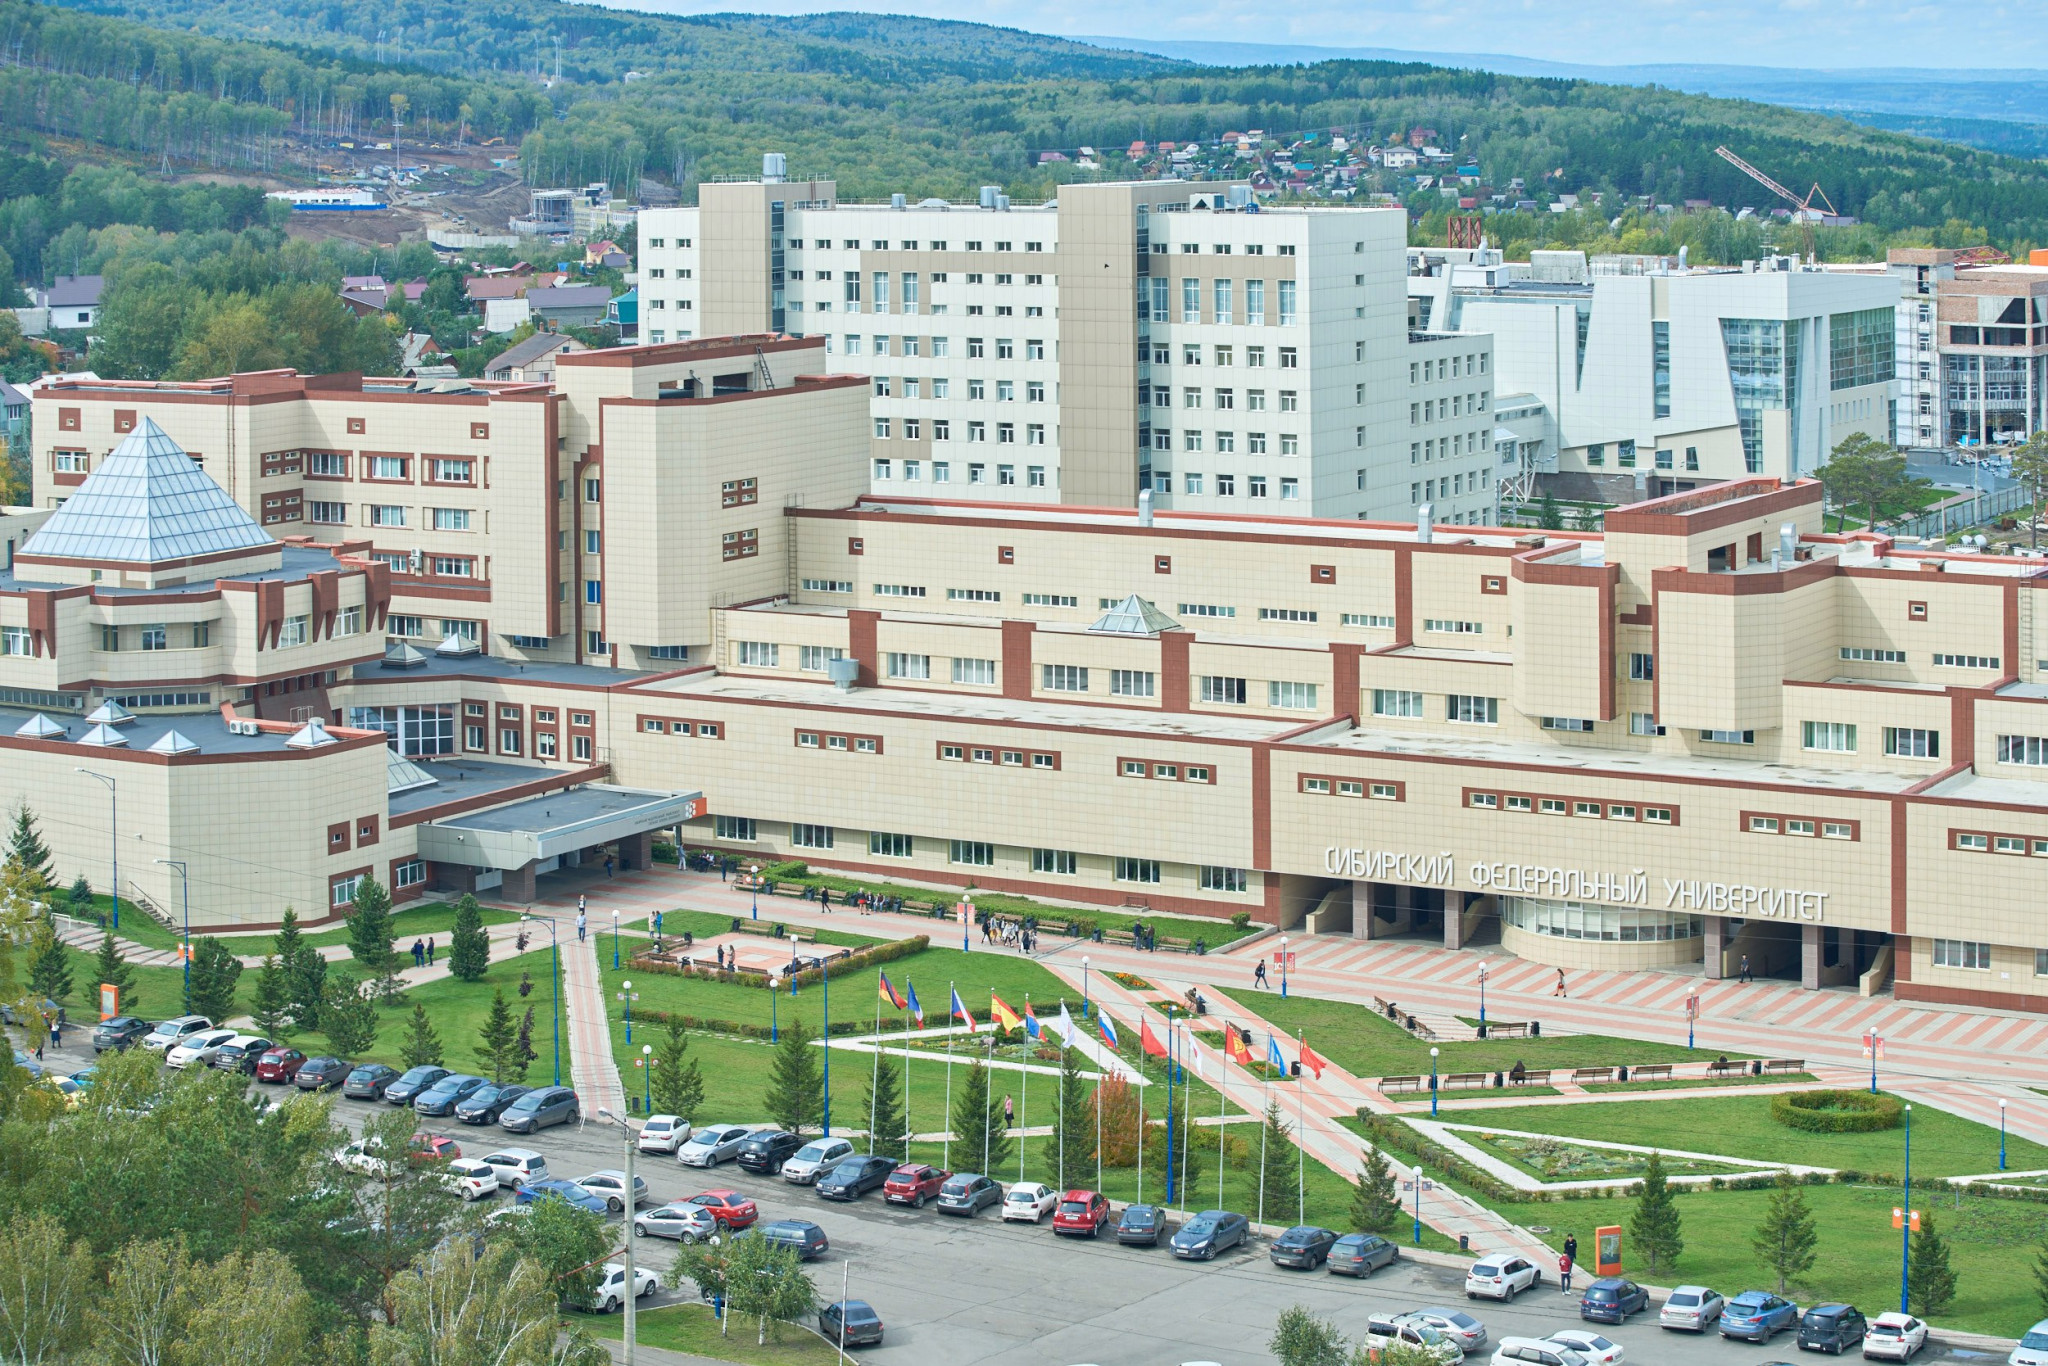 The Siberian Federal University will be the Athletes' Village at Krasnoyarsk 2019 ©Krasnoyarsk 2019